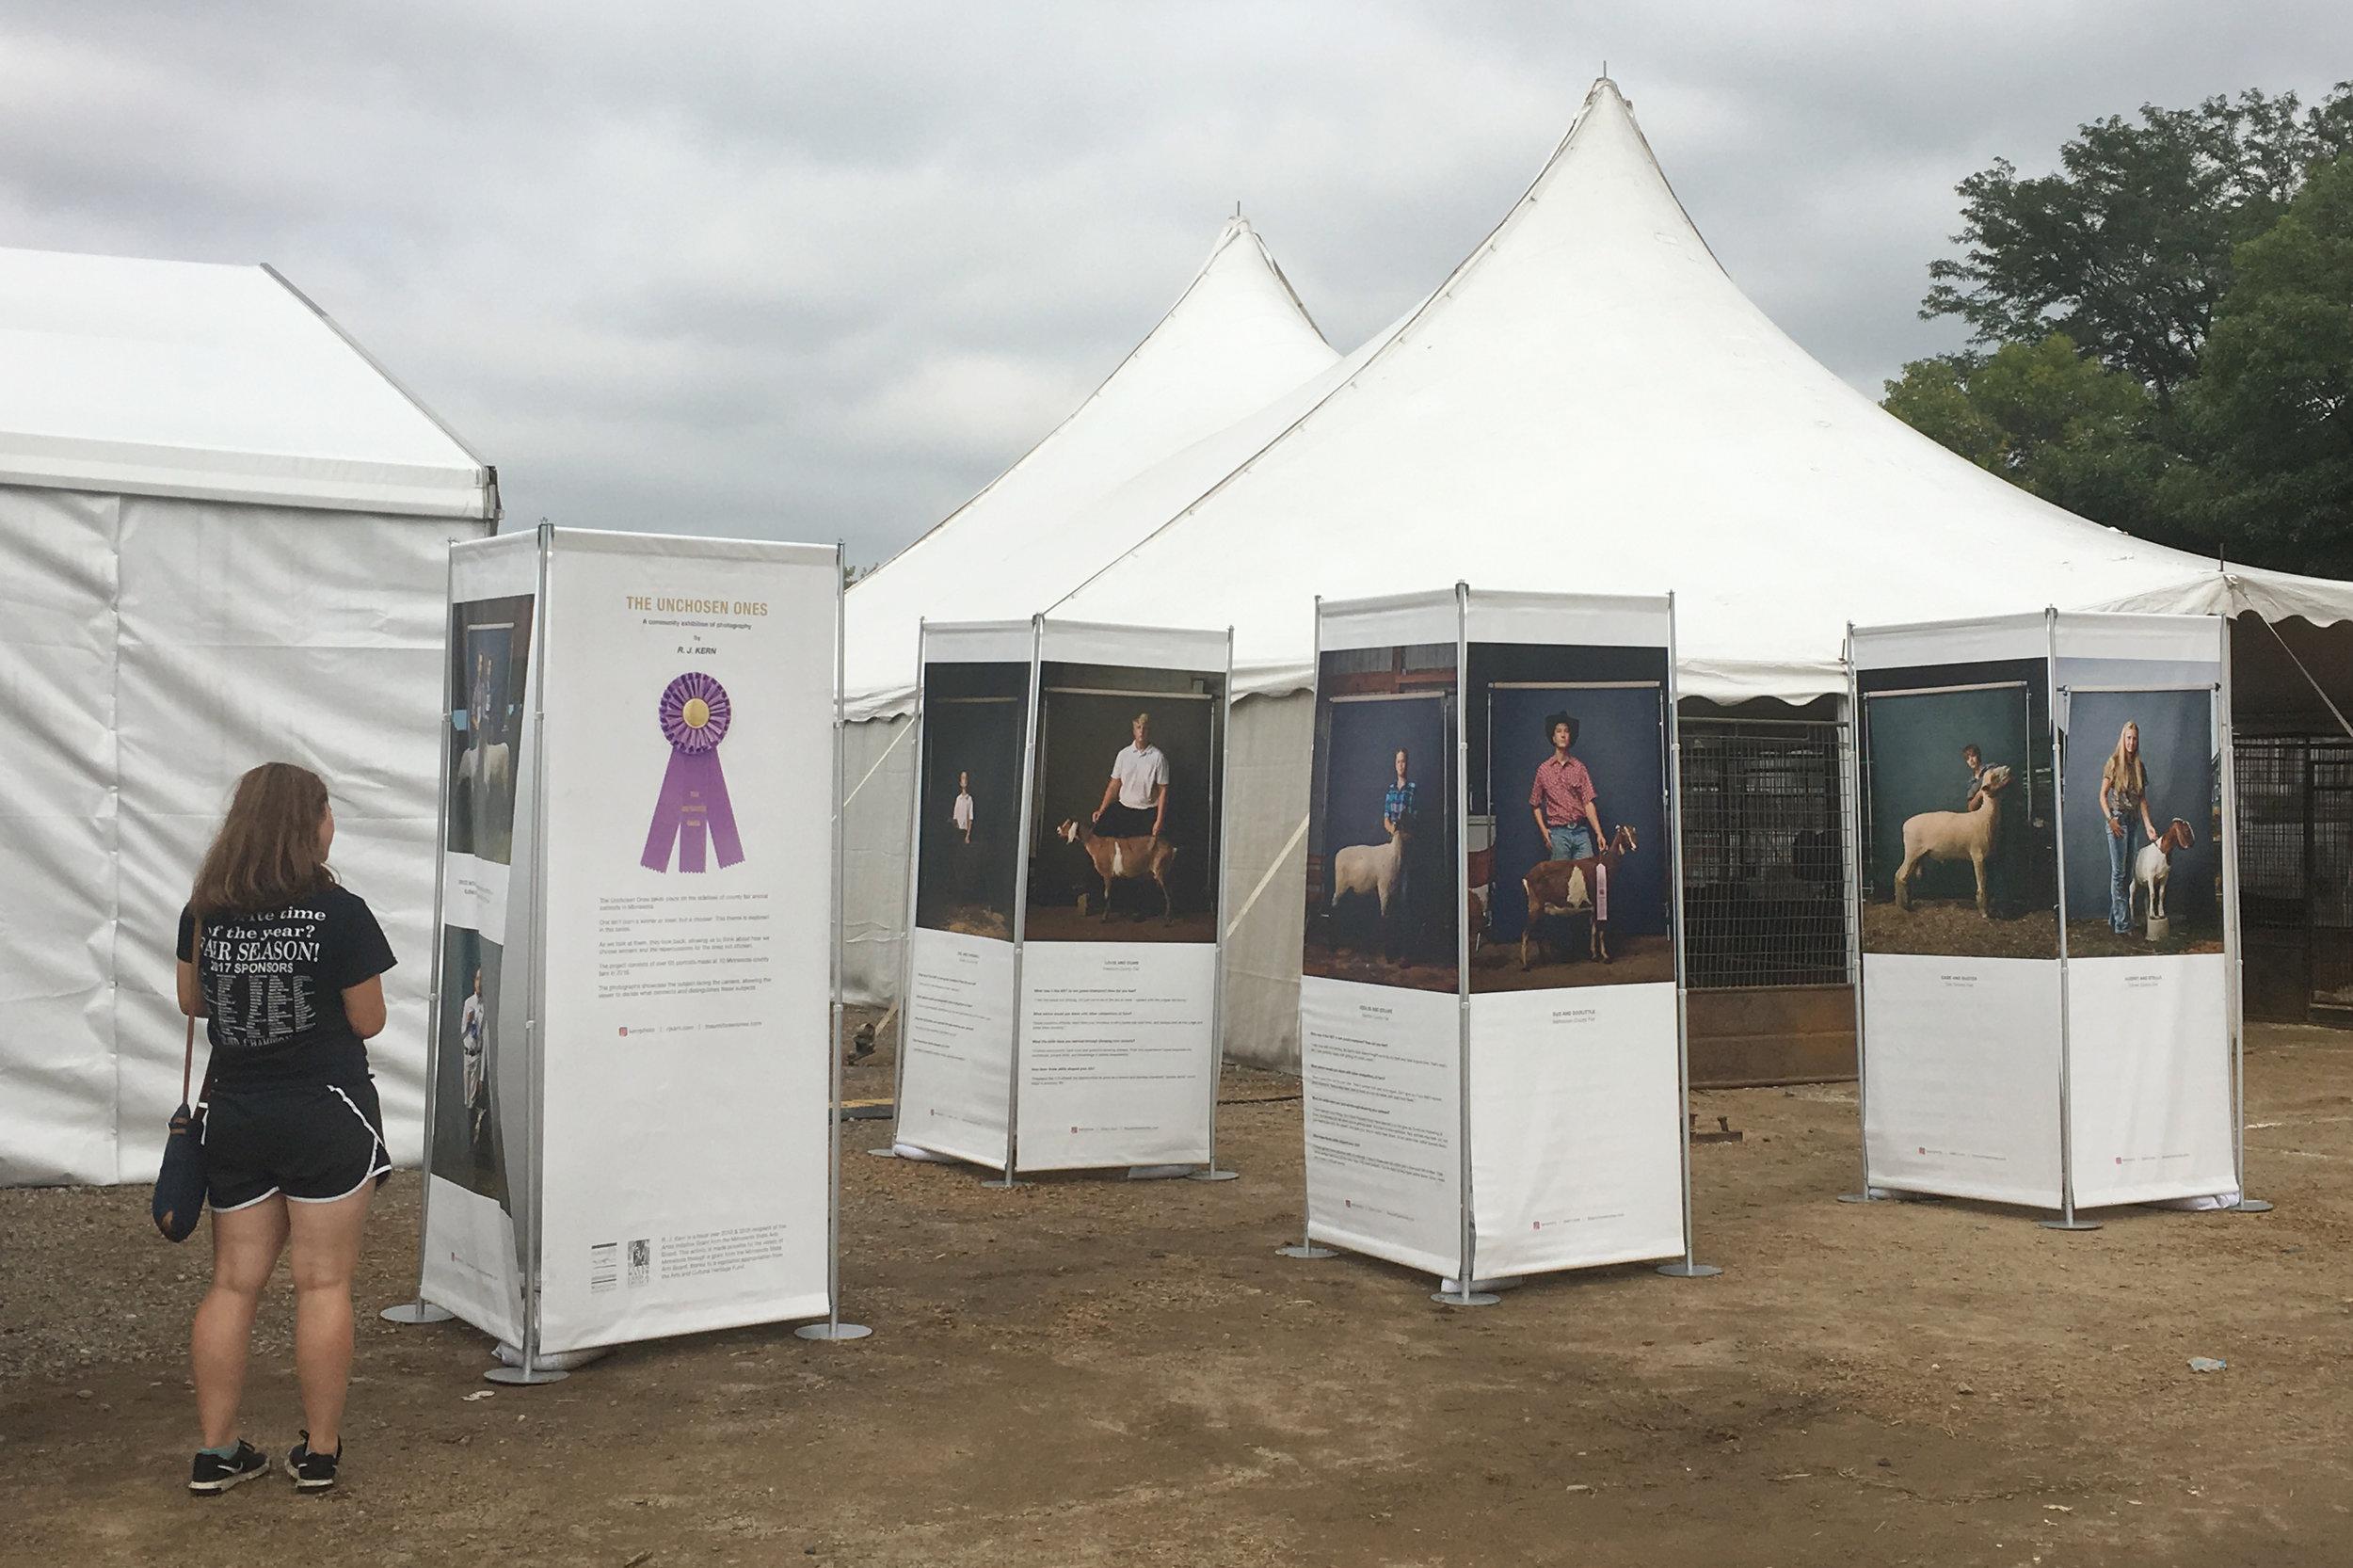 Minnesota State Fair 2018, St. Paul, MN